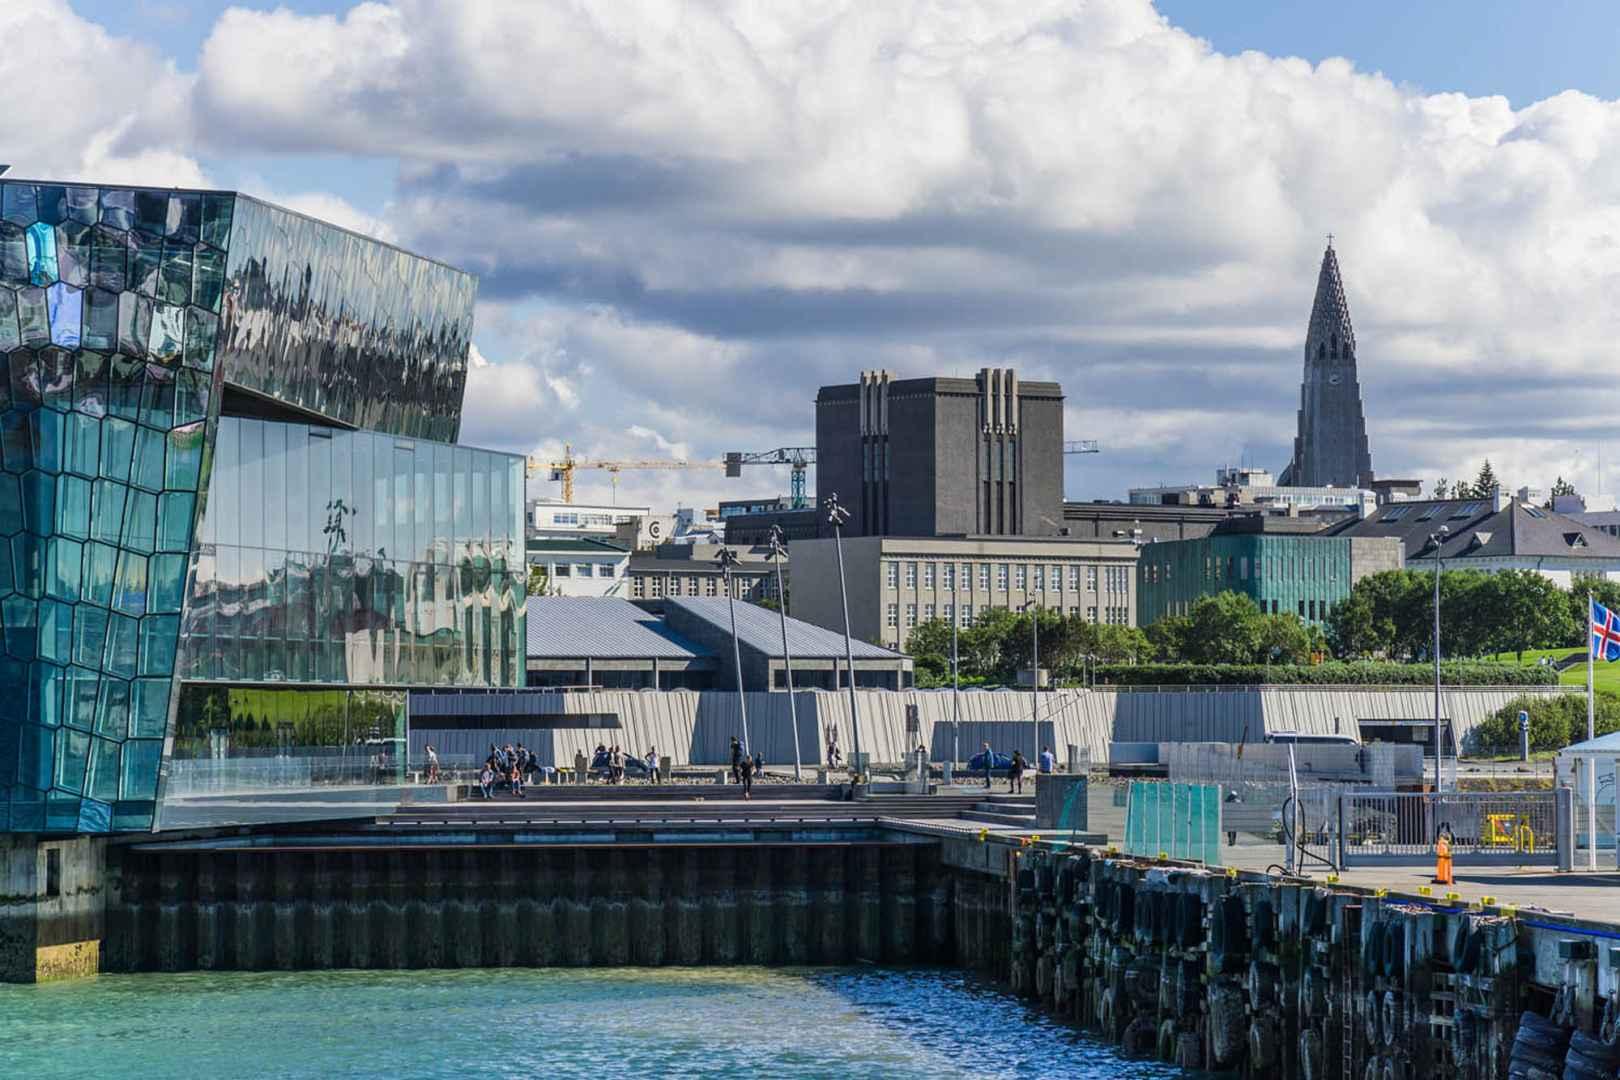 reykjavik iceland tour package